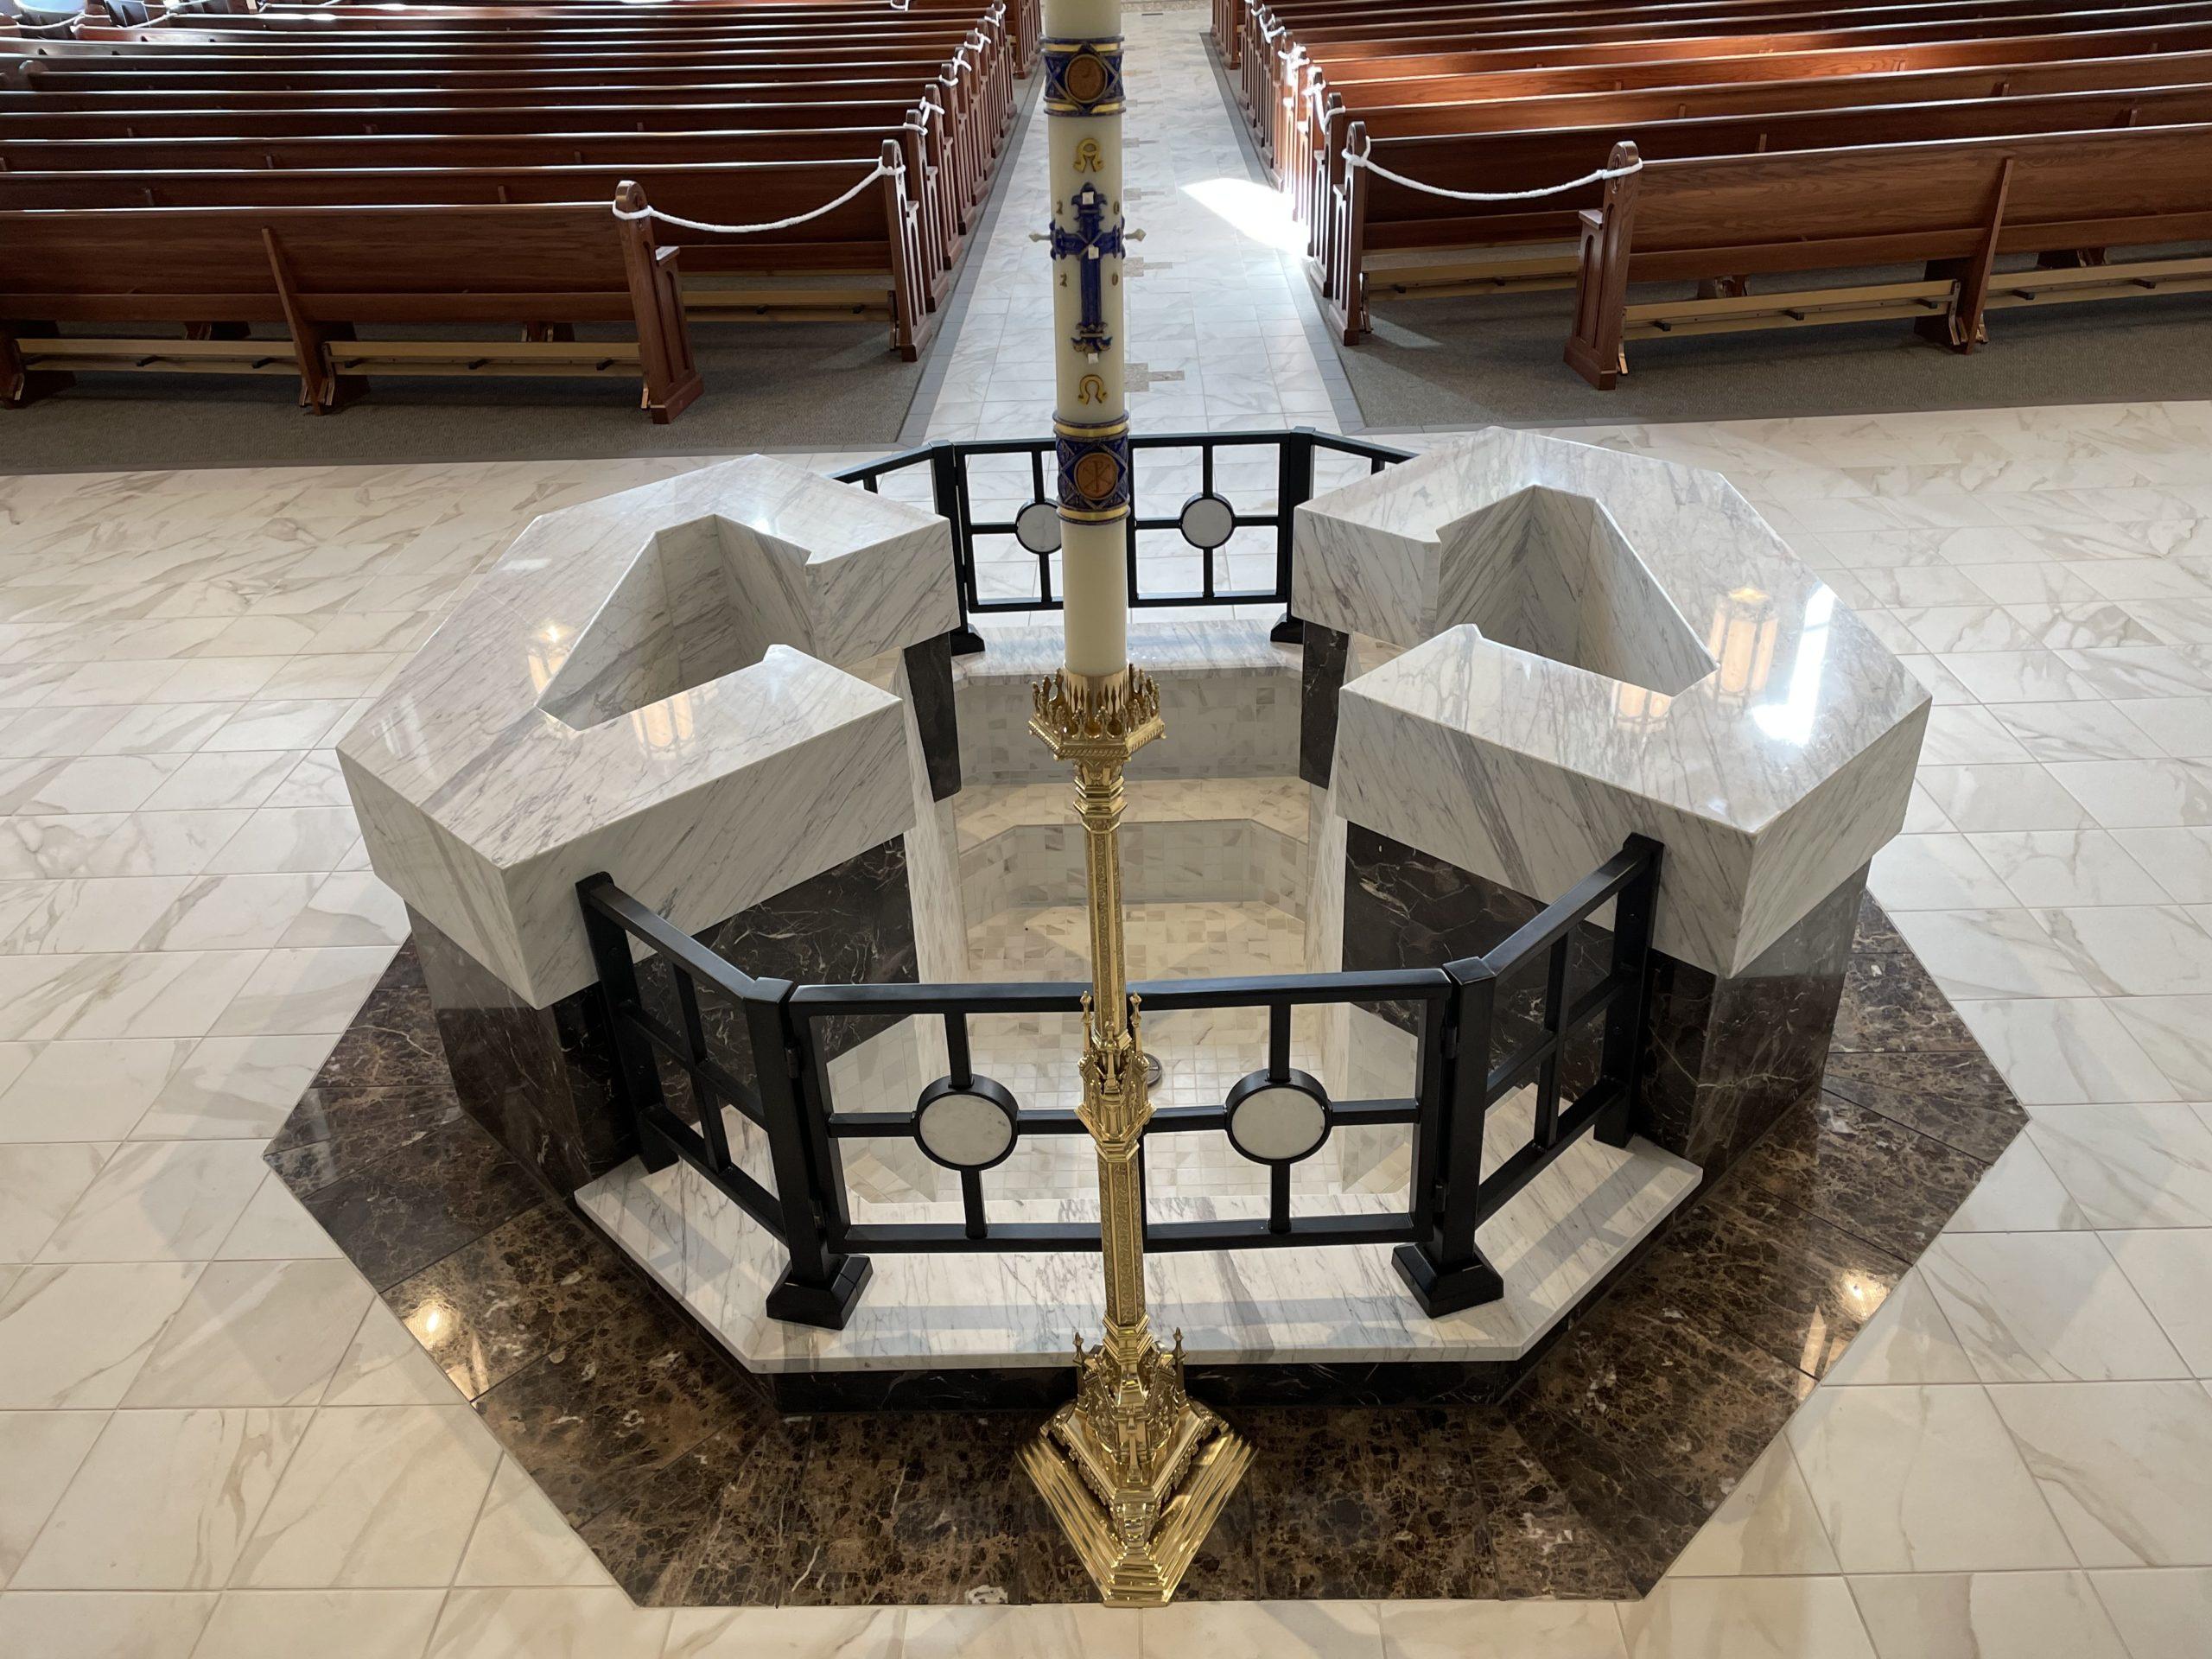 Recessed Semi-Immersion Baptismal Font, St. Elizabeth Ann Seton, Fort Collins, CO.